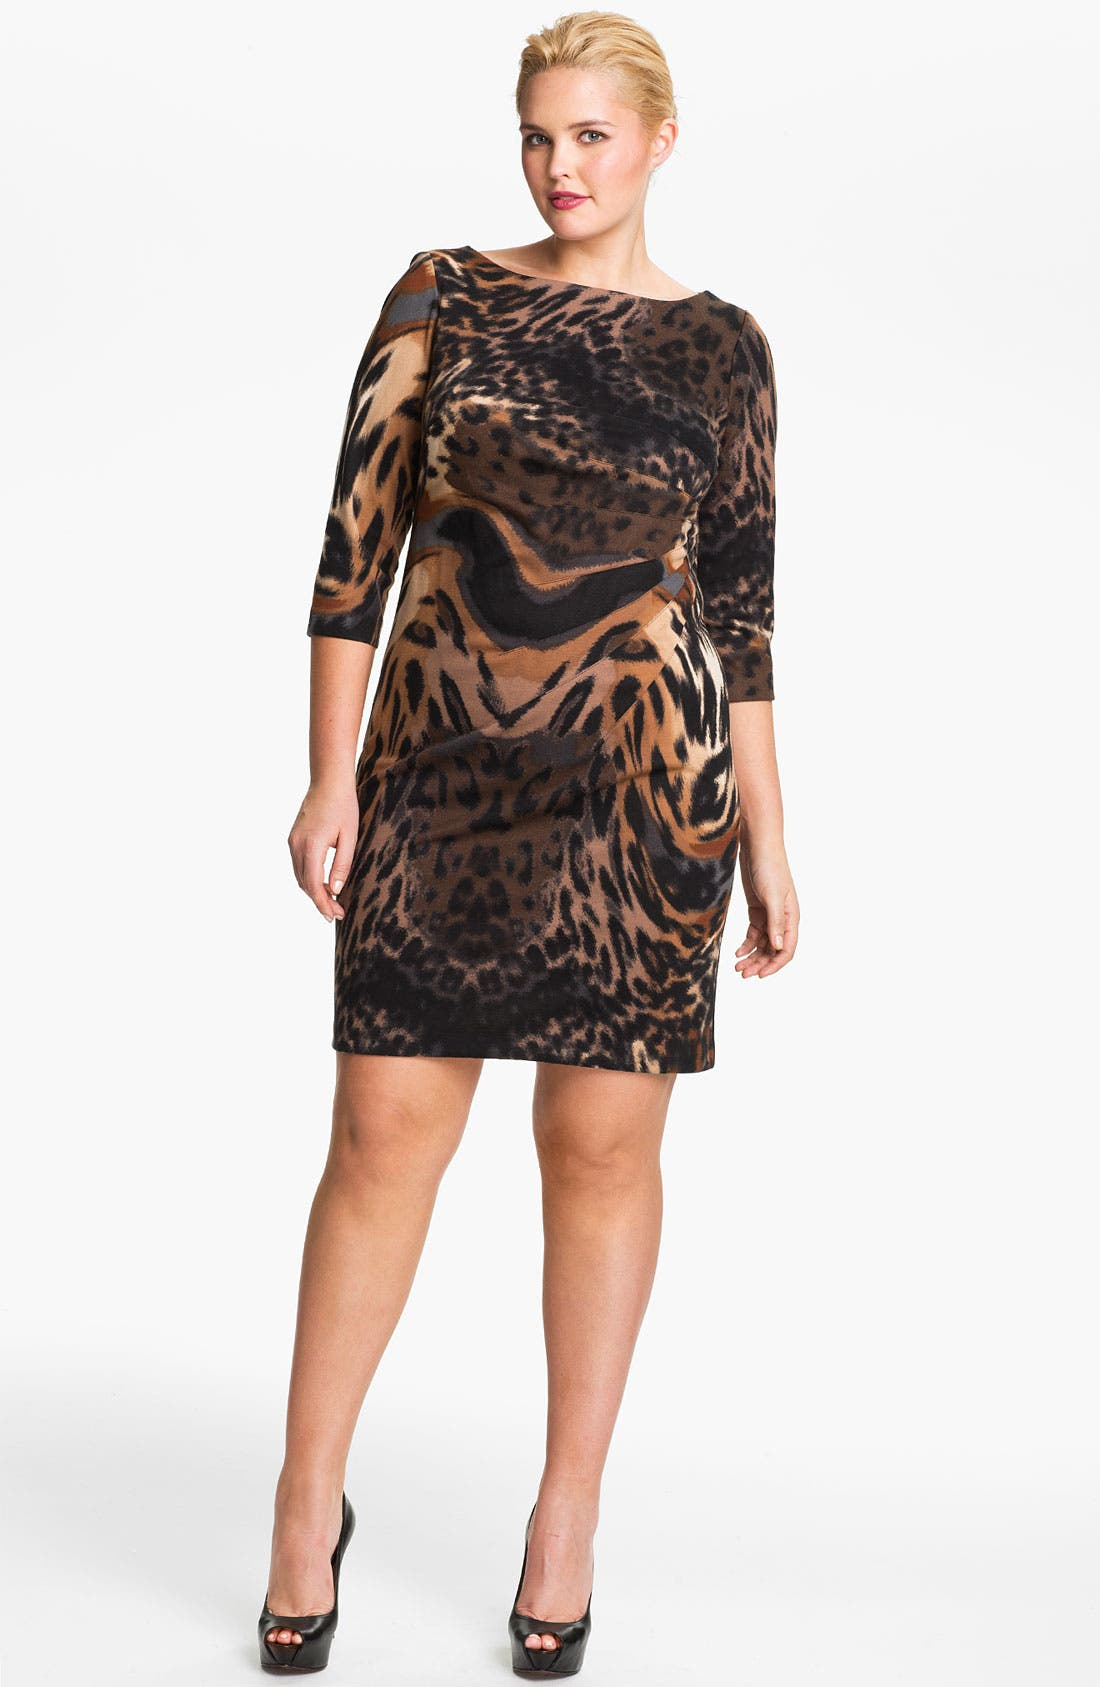 Alternate Image 1 Selected - Jessica Simpson Side Pleat Ponte Knit Sheath Dress (Plus)